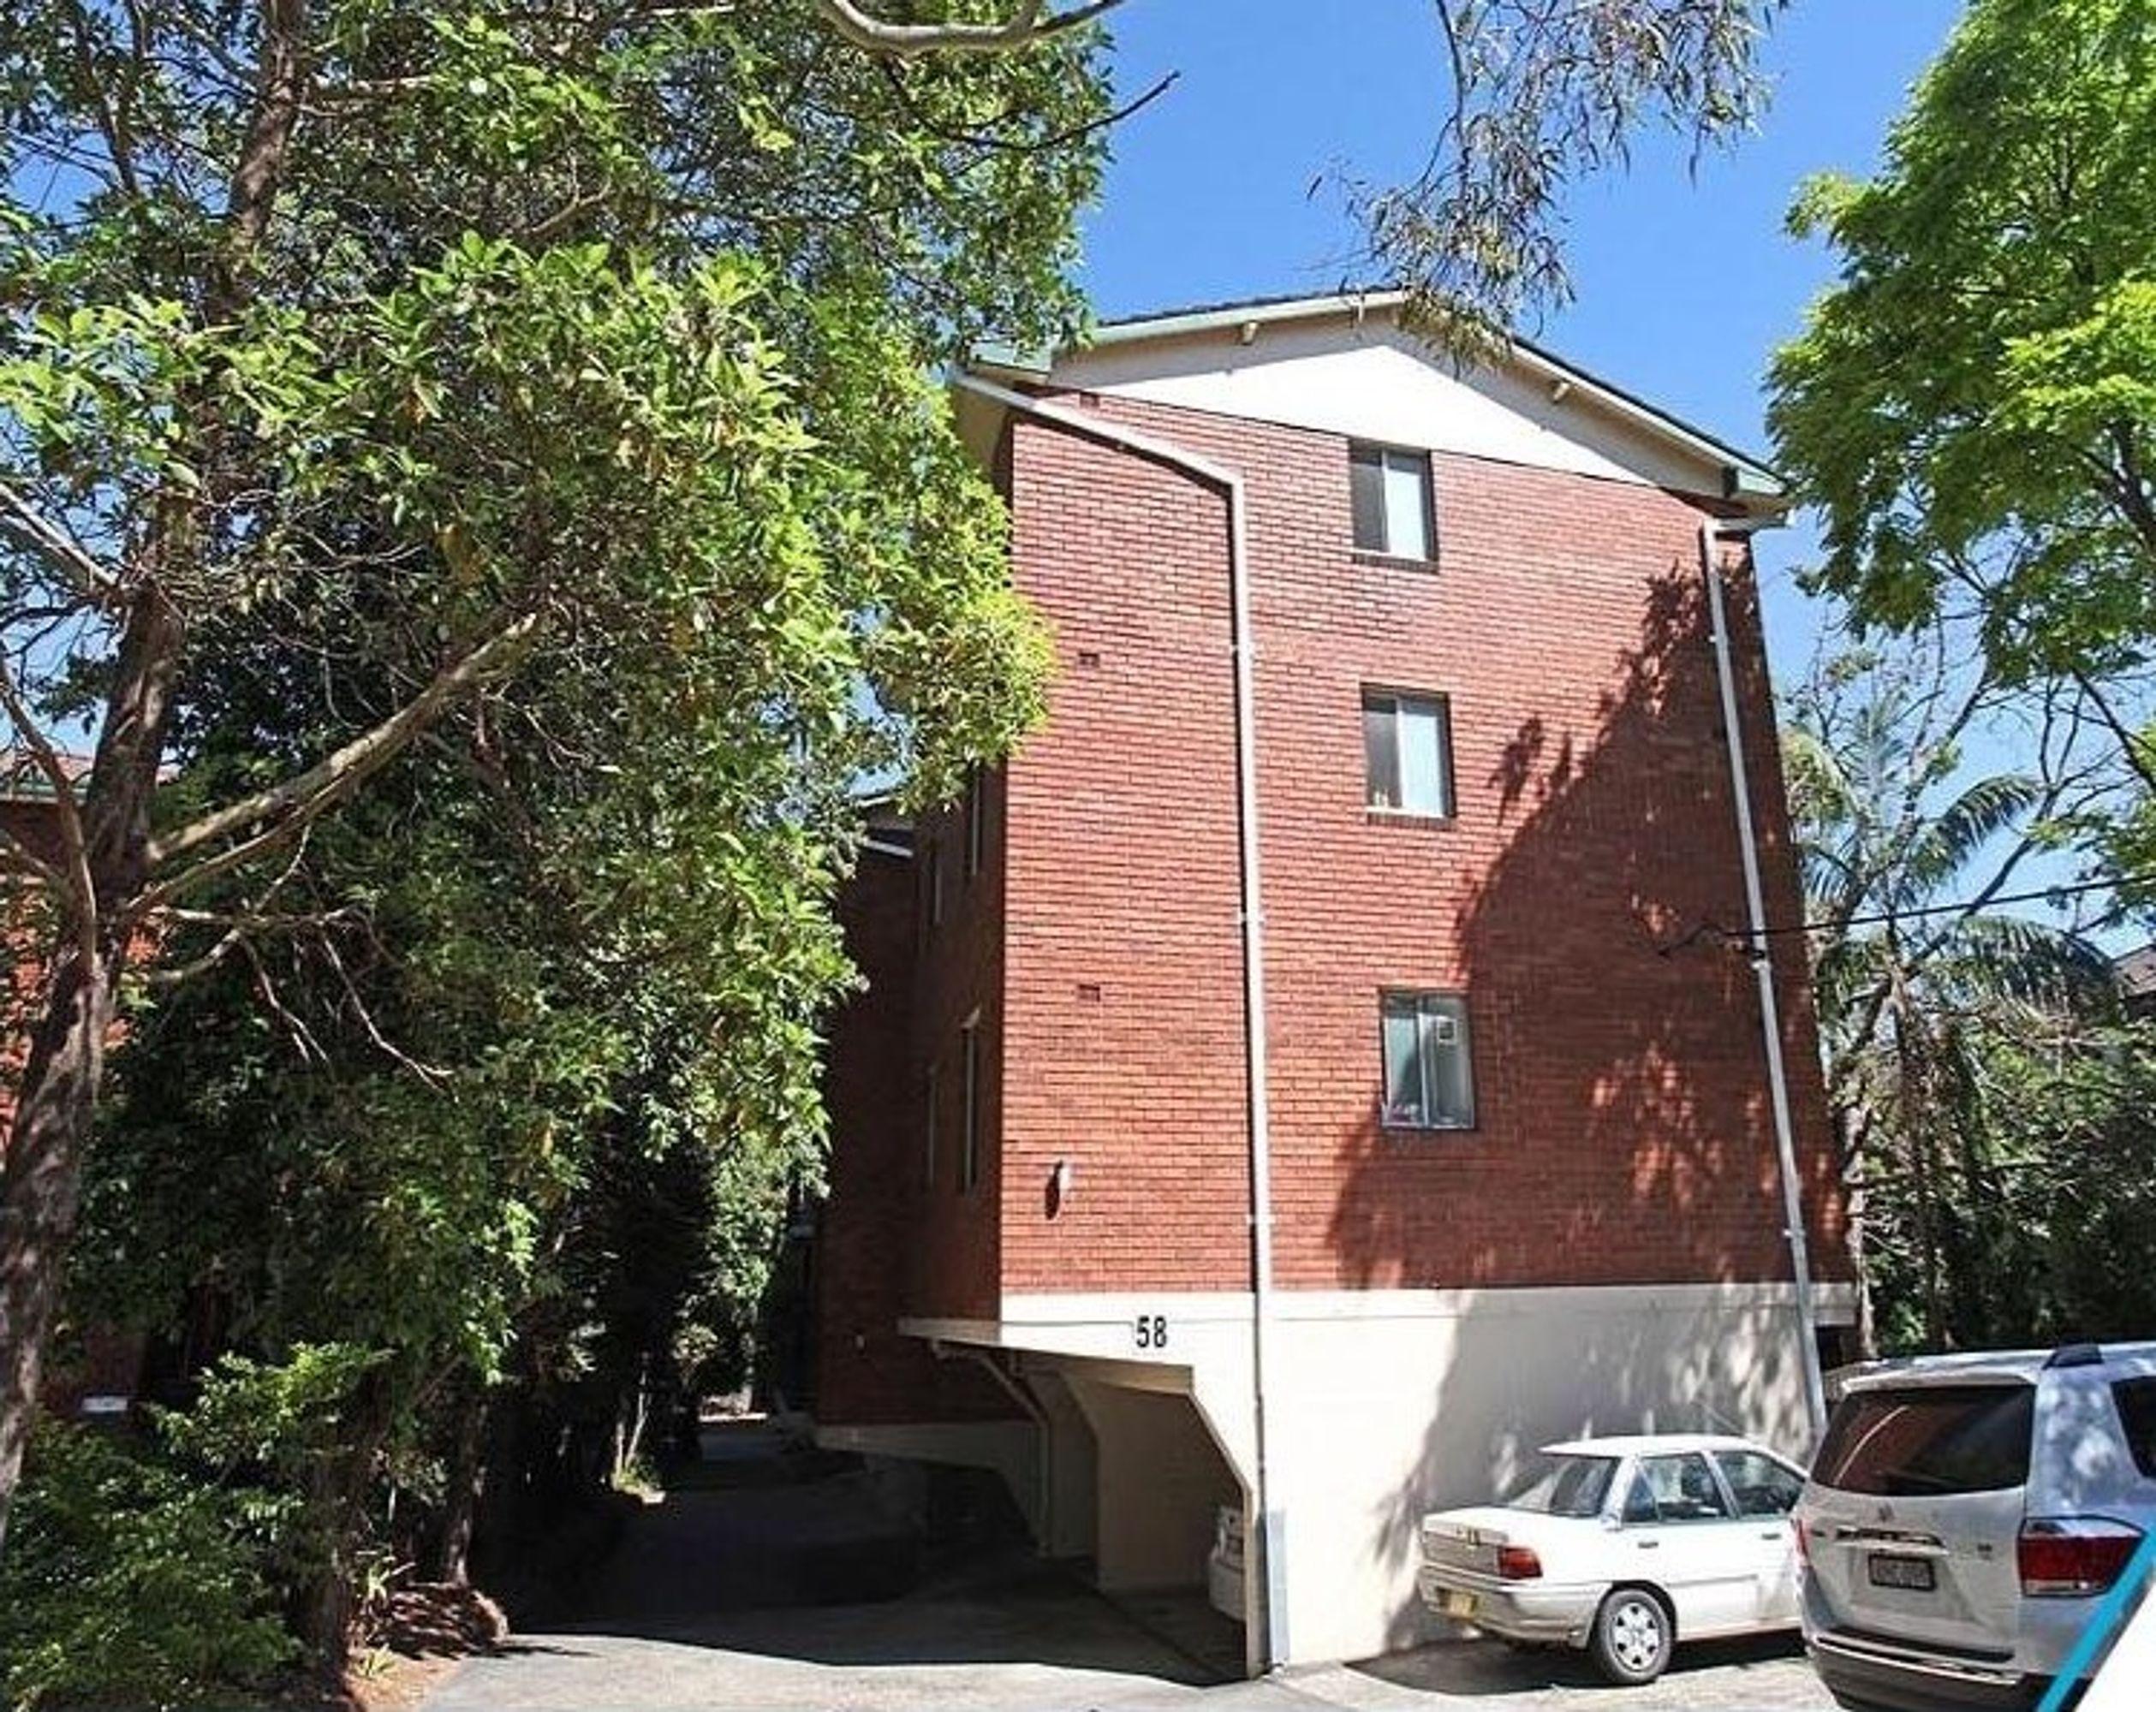 23/58 Meadow Crescent, Meadowbank, NSW 2114